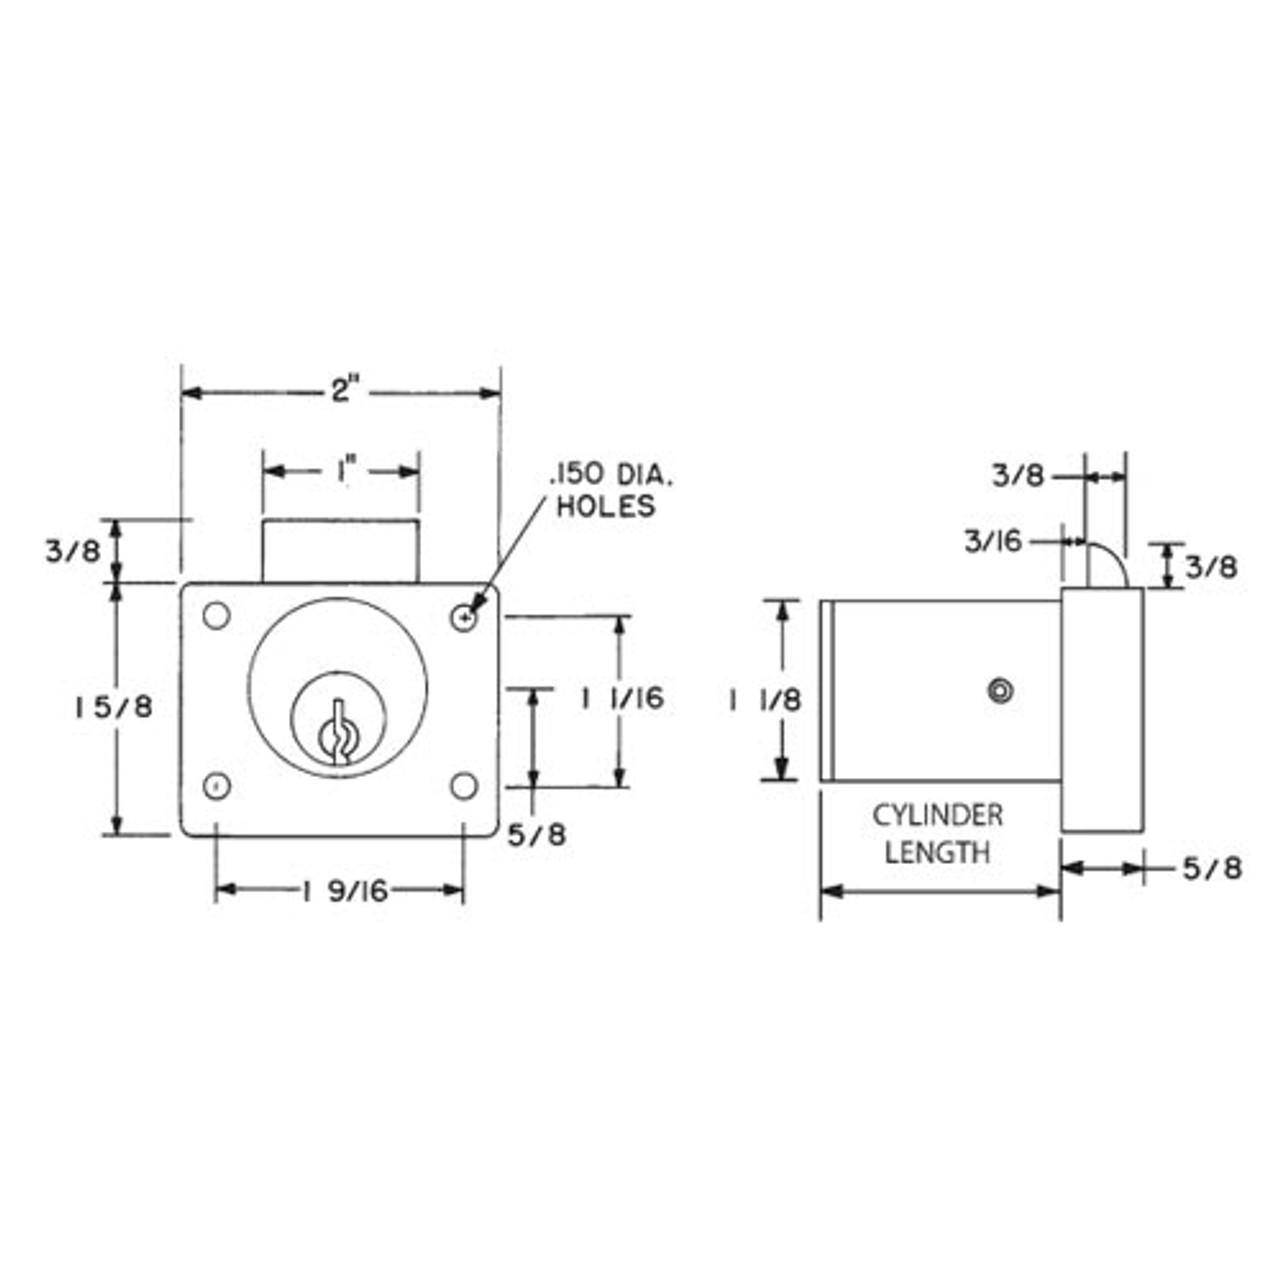 Olympus L78V-VH-KA101-26D-1-1/8 Vertical Handing Drawer Latch Cabinet Lock in Satin Chrome